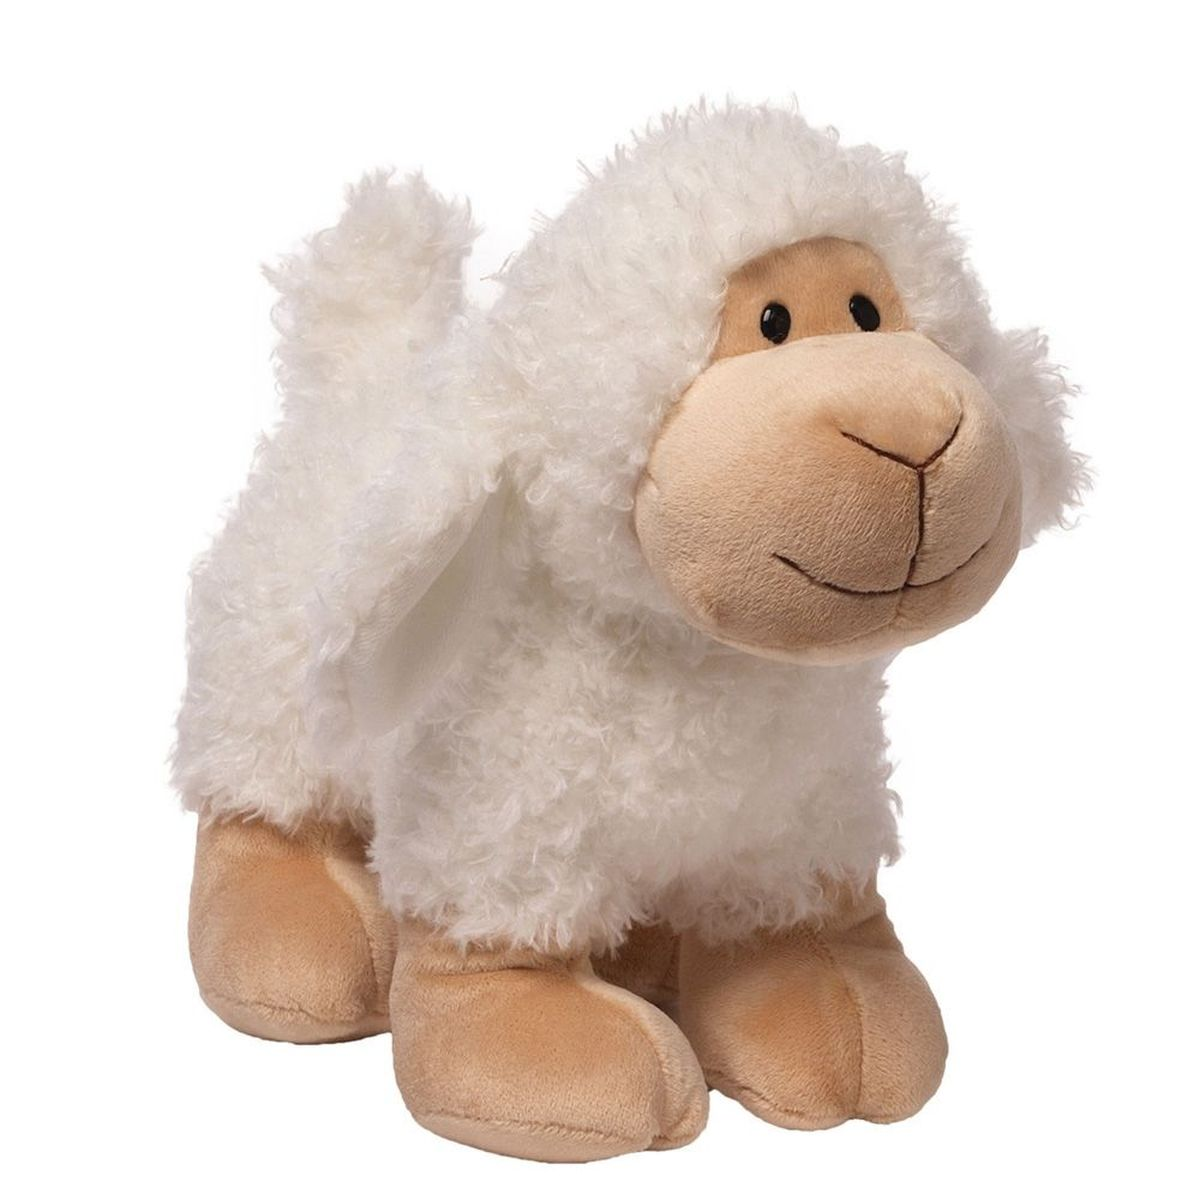 Gund Мягкая игрушка Wooly 23 см gund мягкая игрушка wooly 23 см